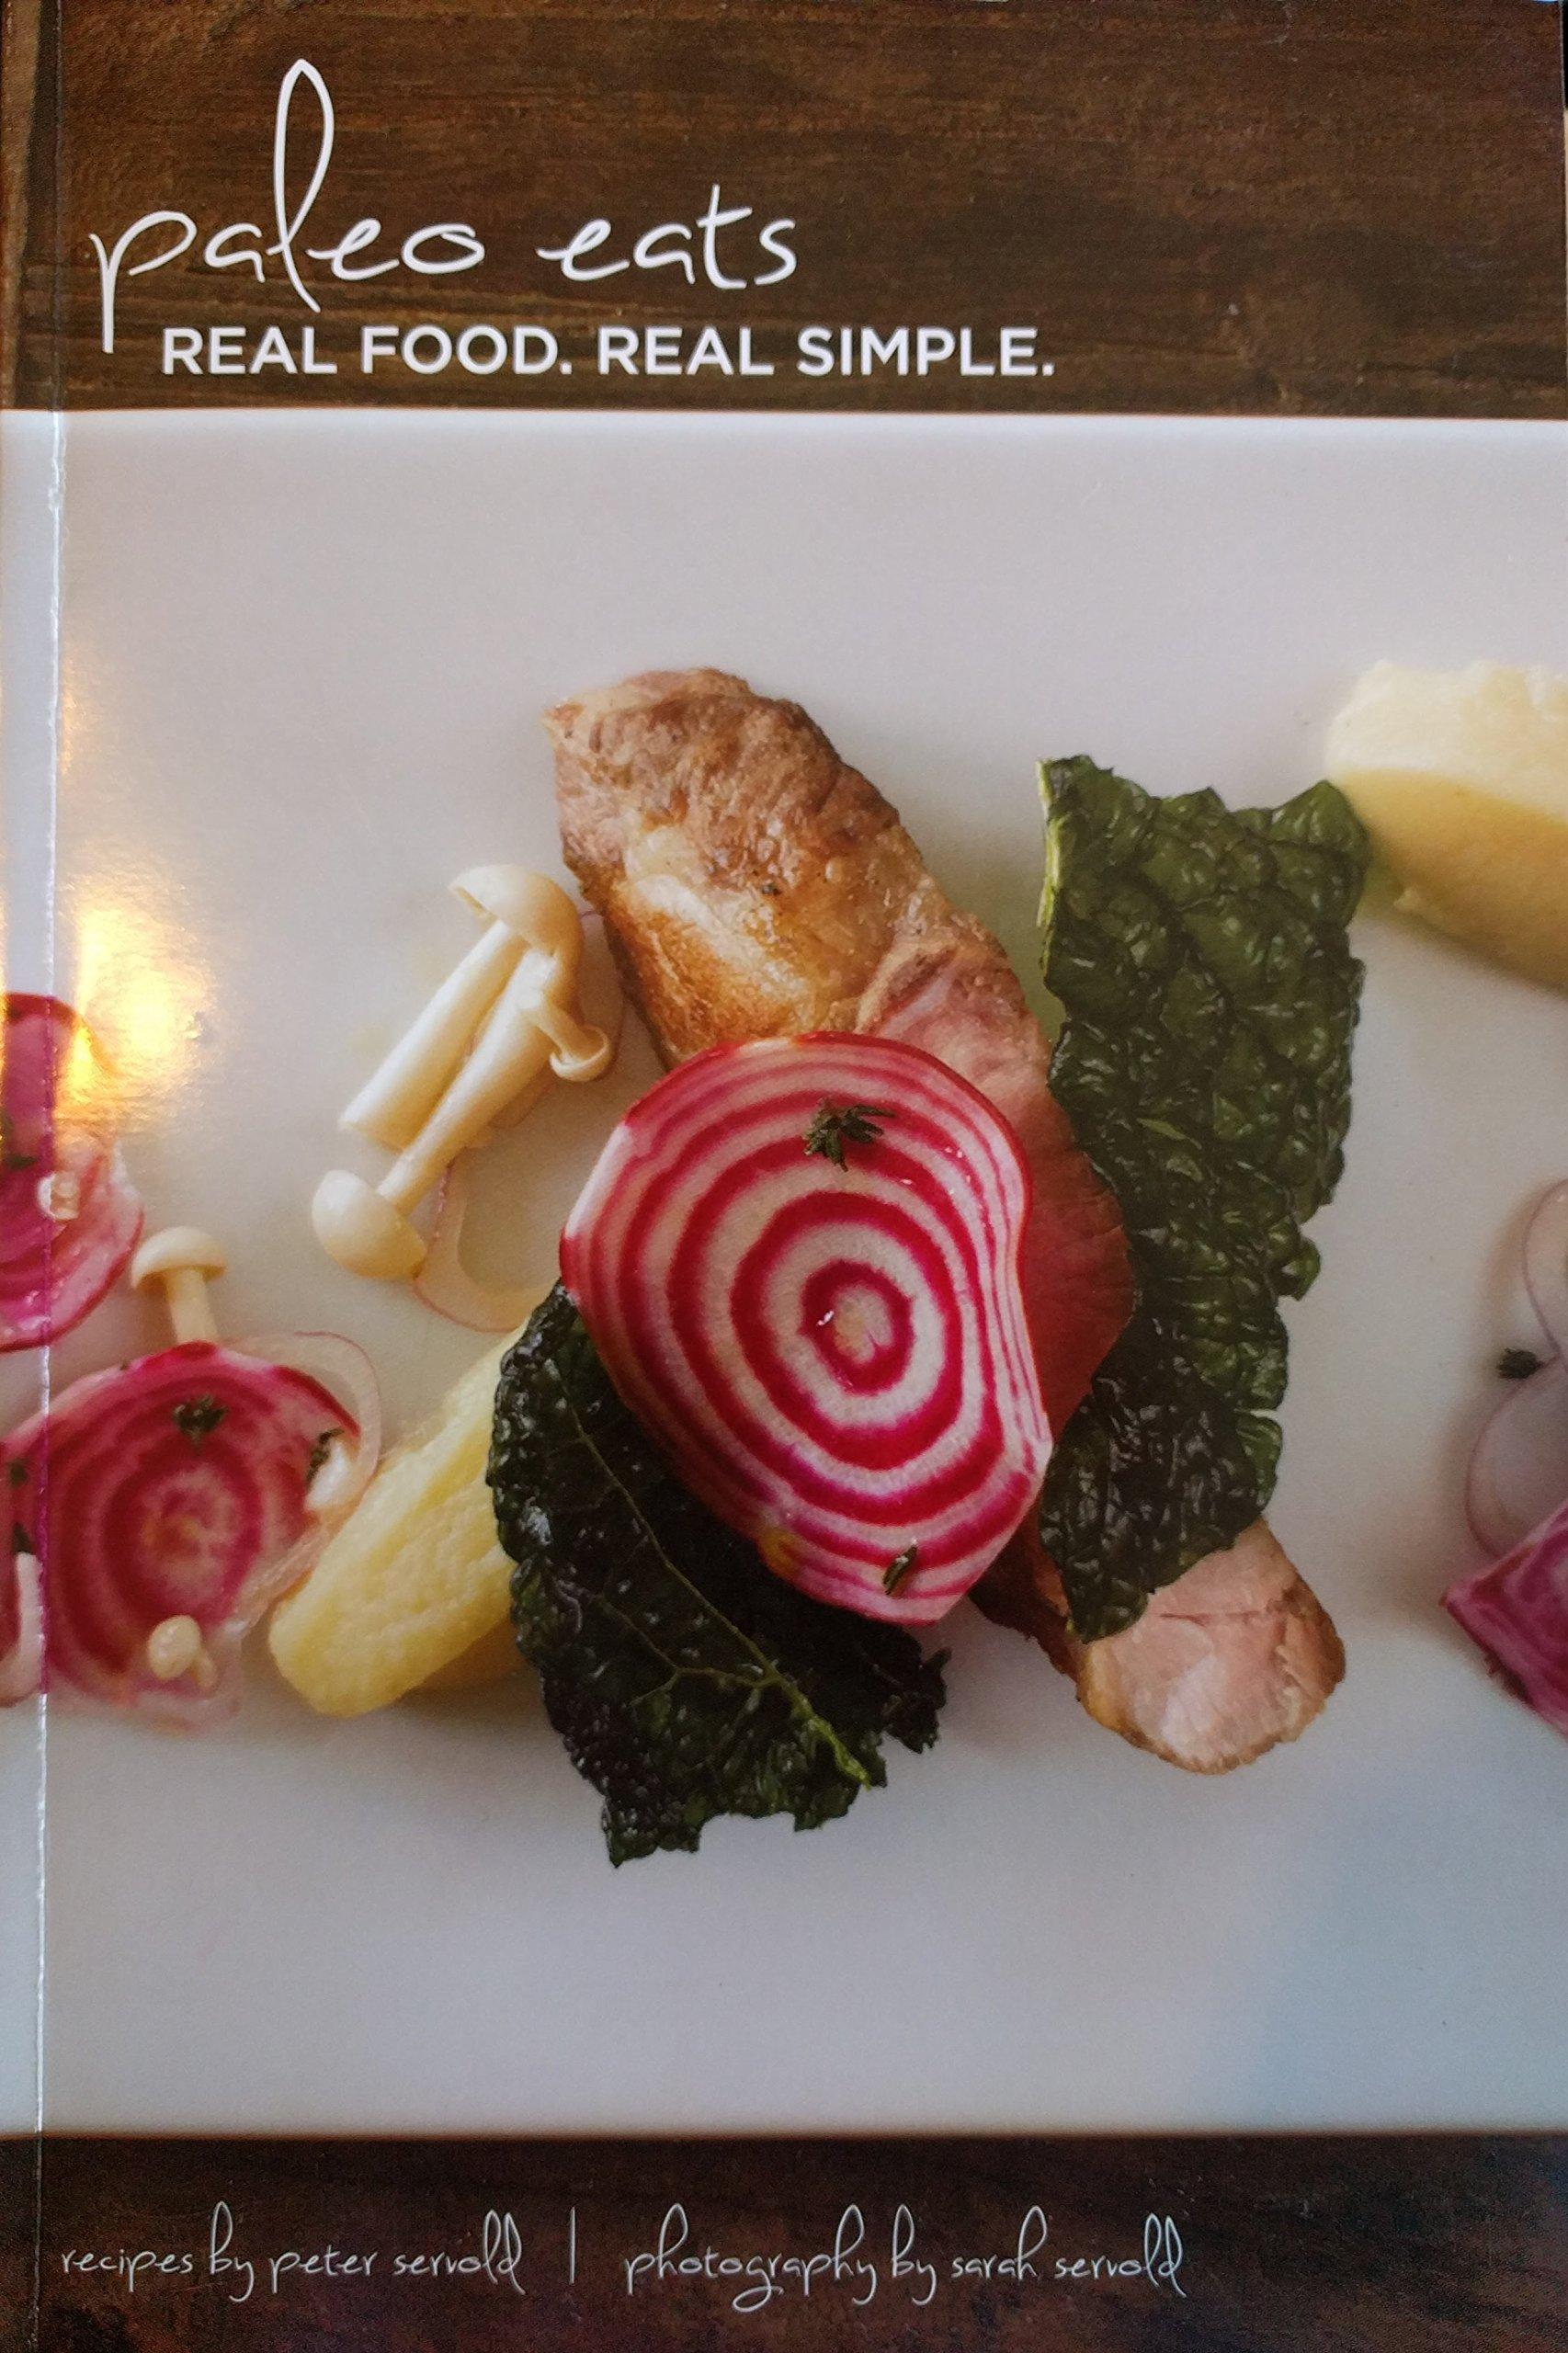 Paleo Eats: Real Food. Real Simple. Text fb2 ebook